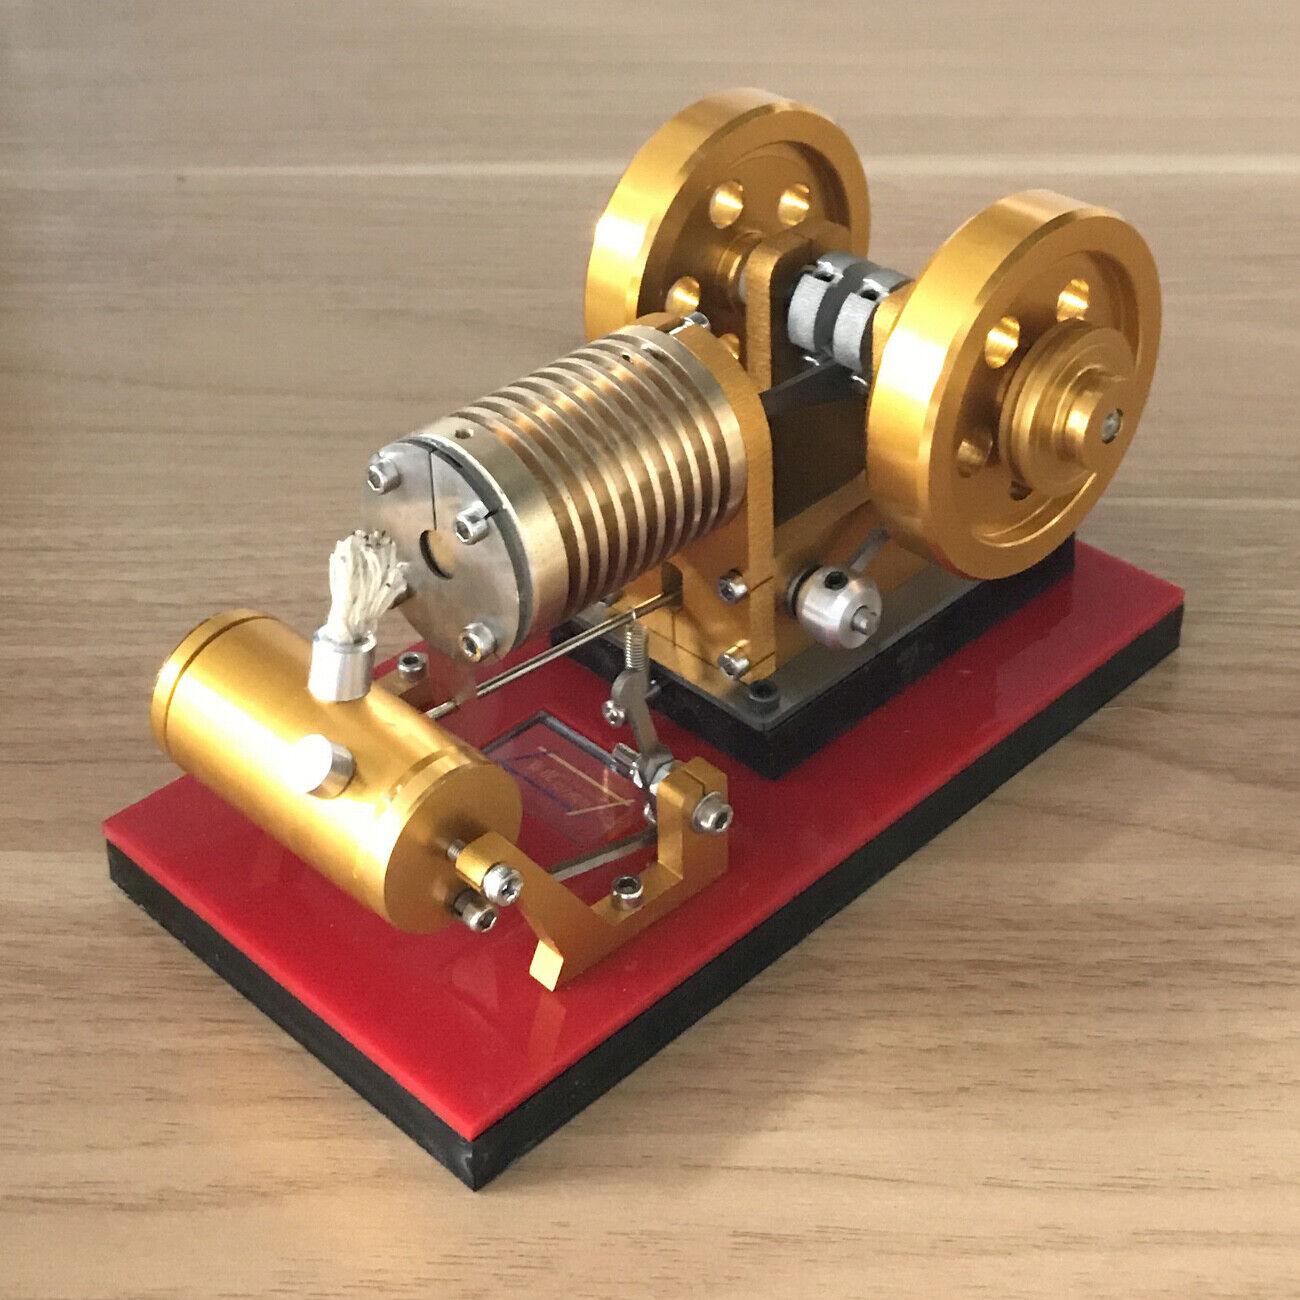 Flame Eater Flame Dancer Flame Gulper Engine Vacuum Engine Motor Tractor Model